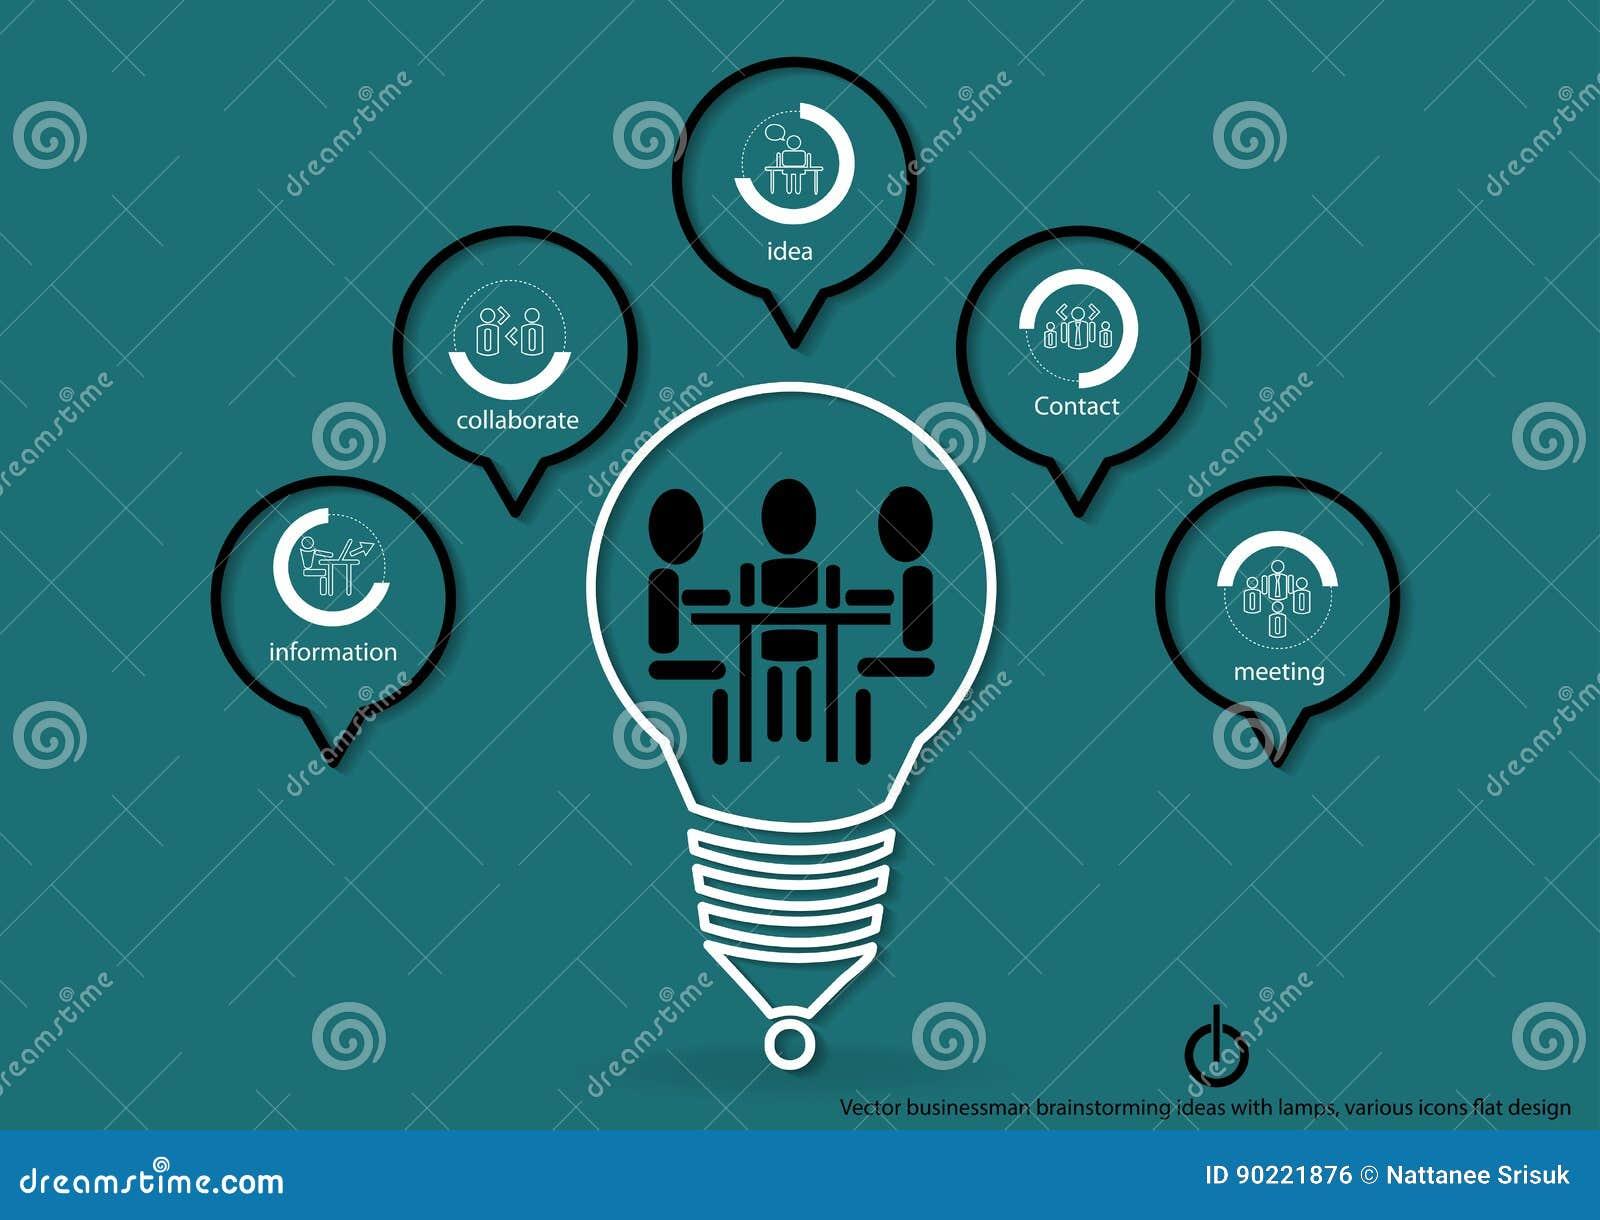 Vector Geschäftsmannbrainstormingideen mit Lampen, flaches Design der verschiedenen Ikonen